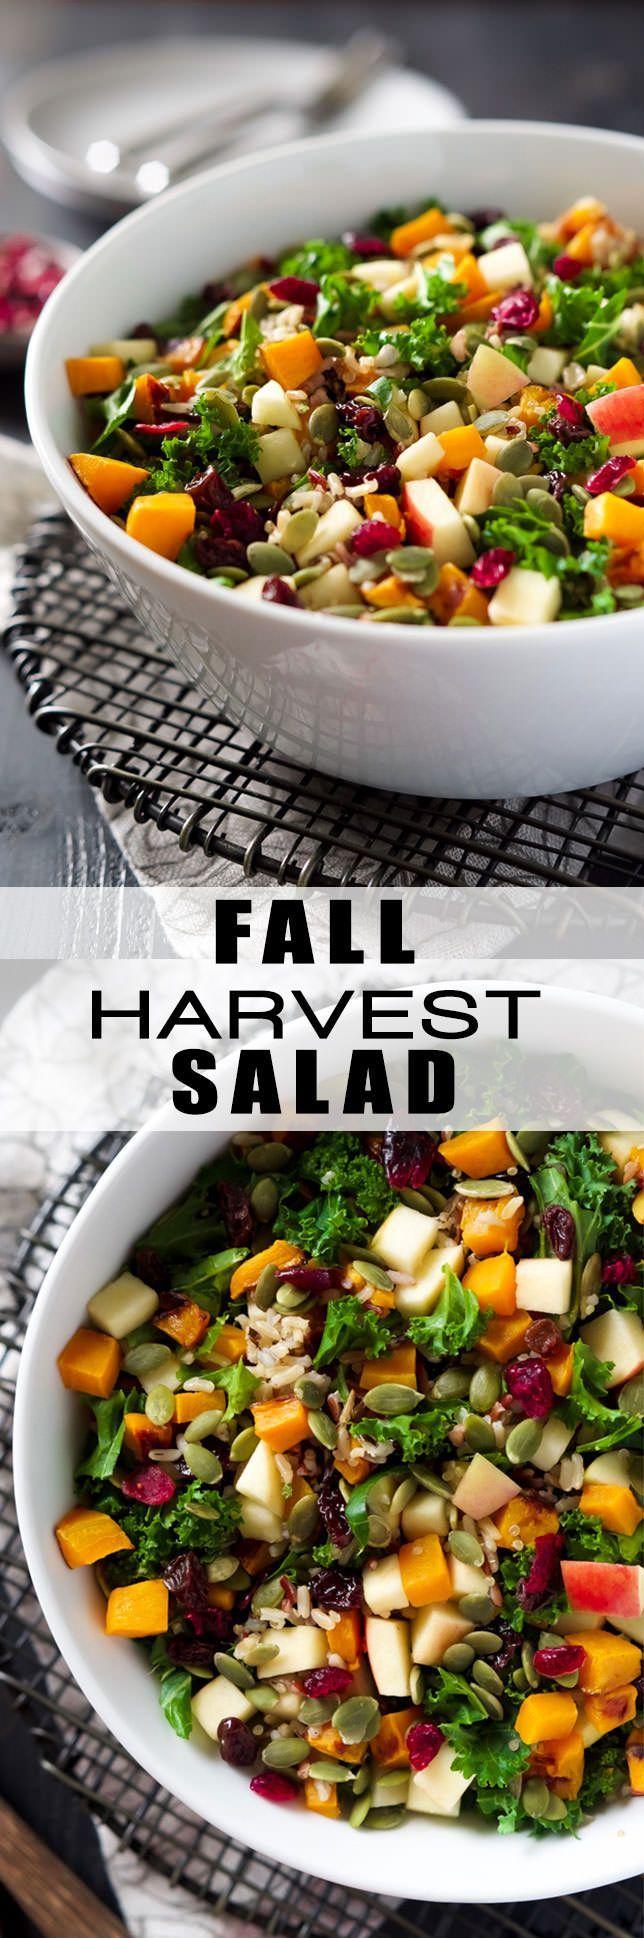 Healthy Easy Fall Salad Recipe | Butternut squash, apples,  apple cider vinegar dressing, dried cranberries, Thanksgiving, Holidays, Seeds, Gluten Free, Vegan